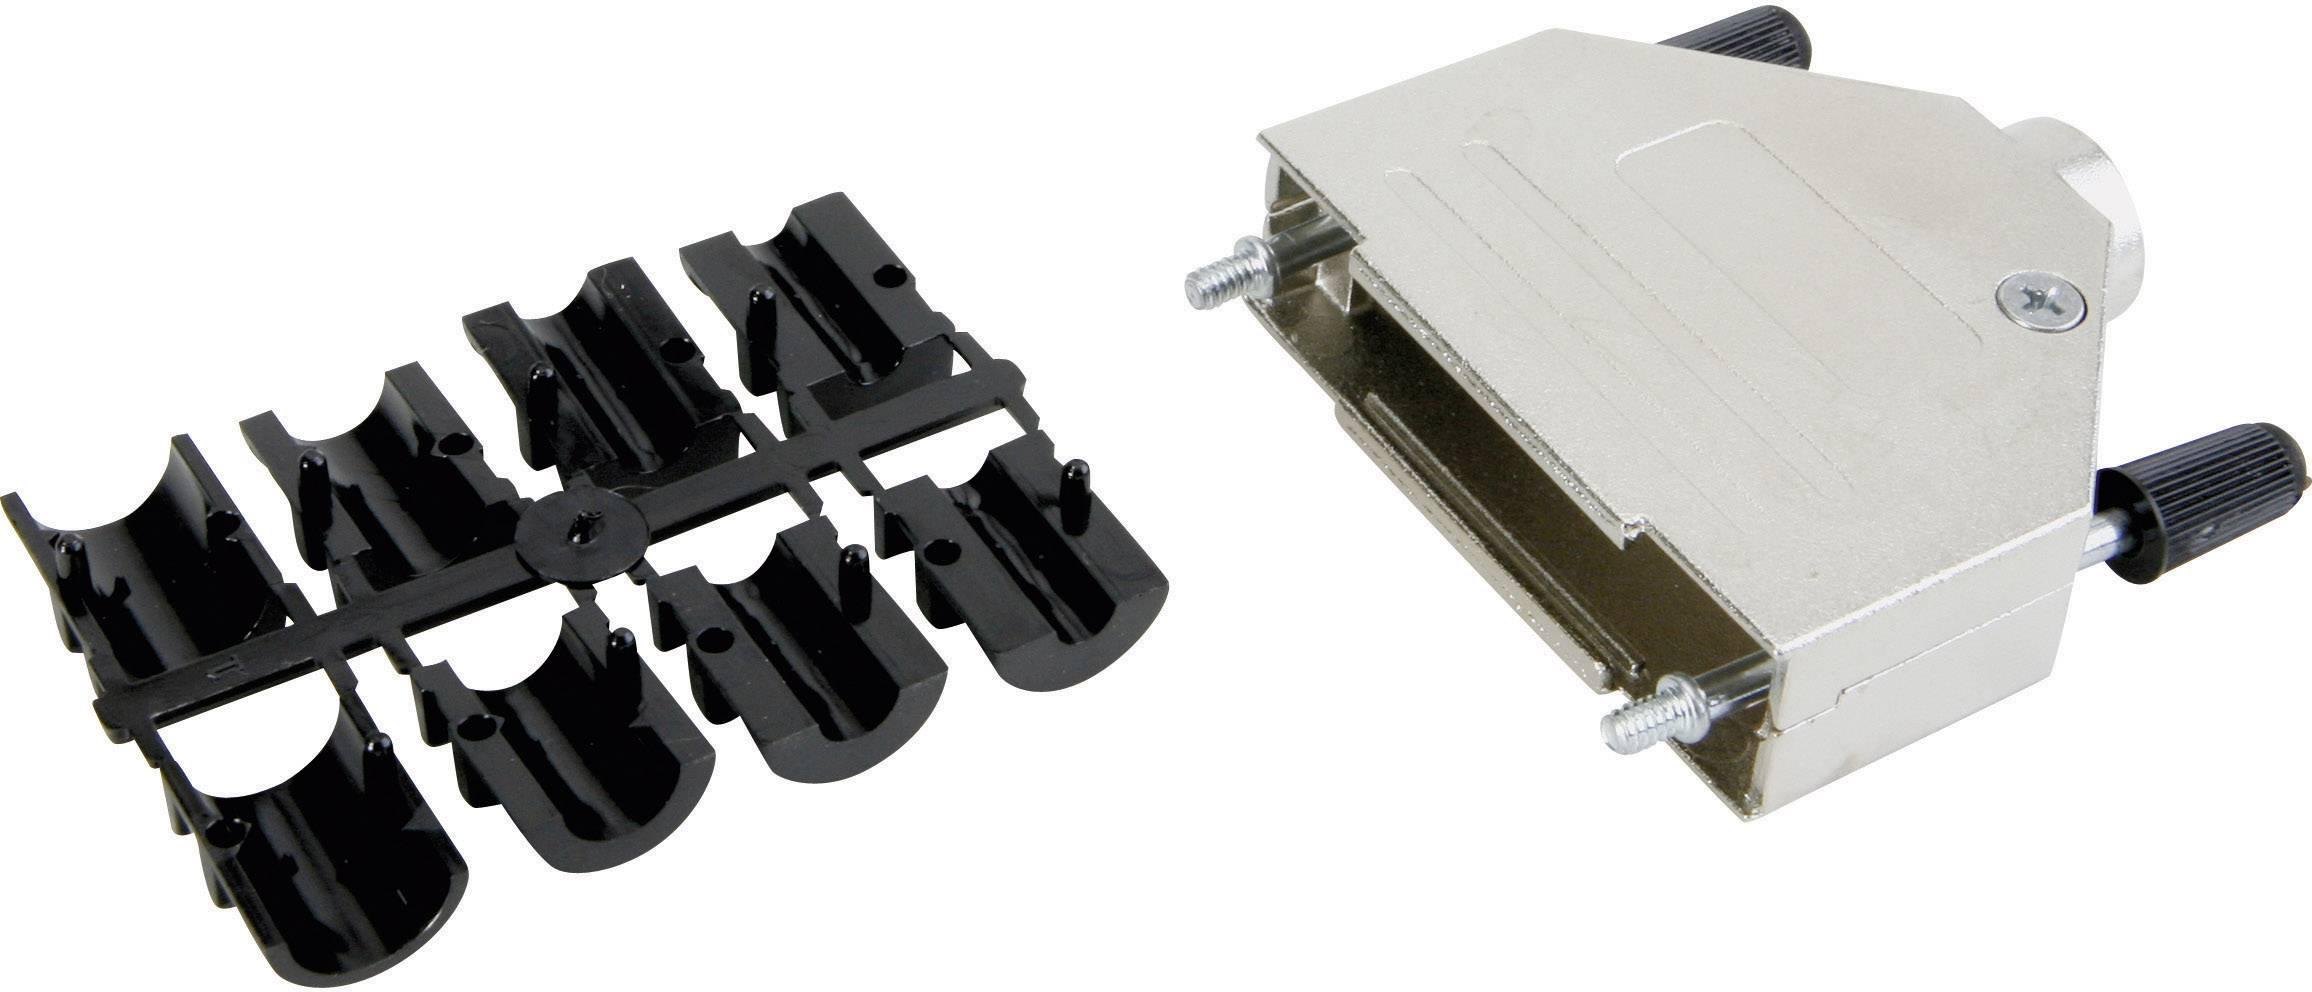 D-SUB pouzdro Conec 165X02629XE 165X02629XE, pólů 25, kov, 180 °, stříbrná, 1 ks